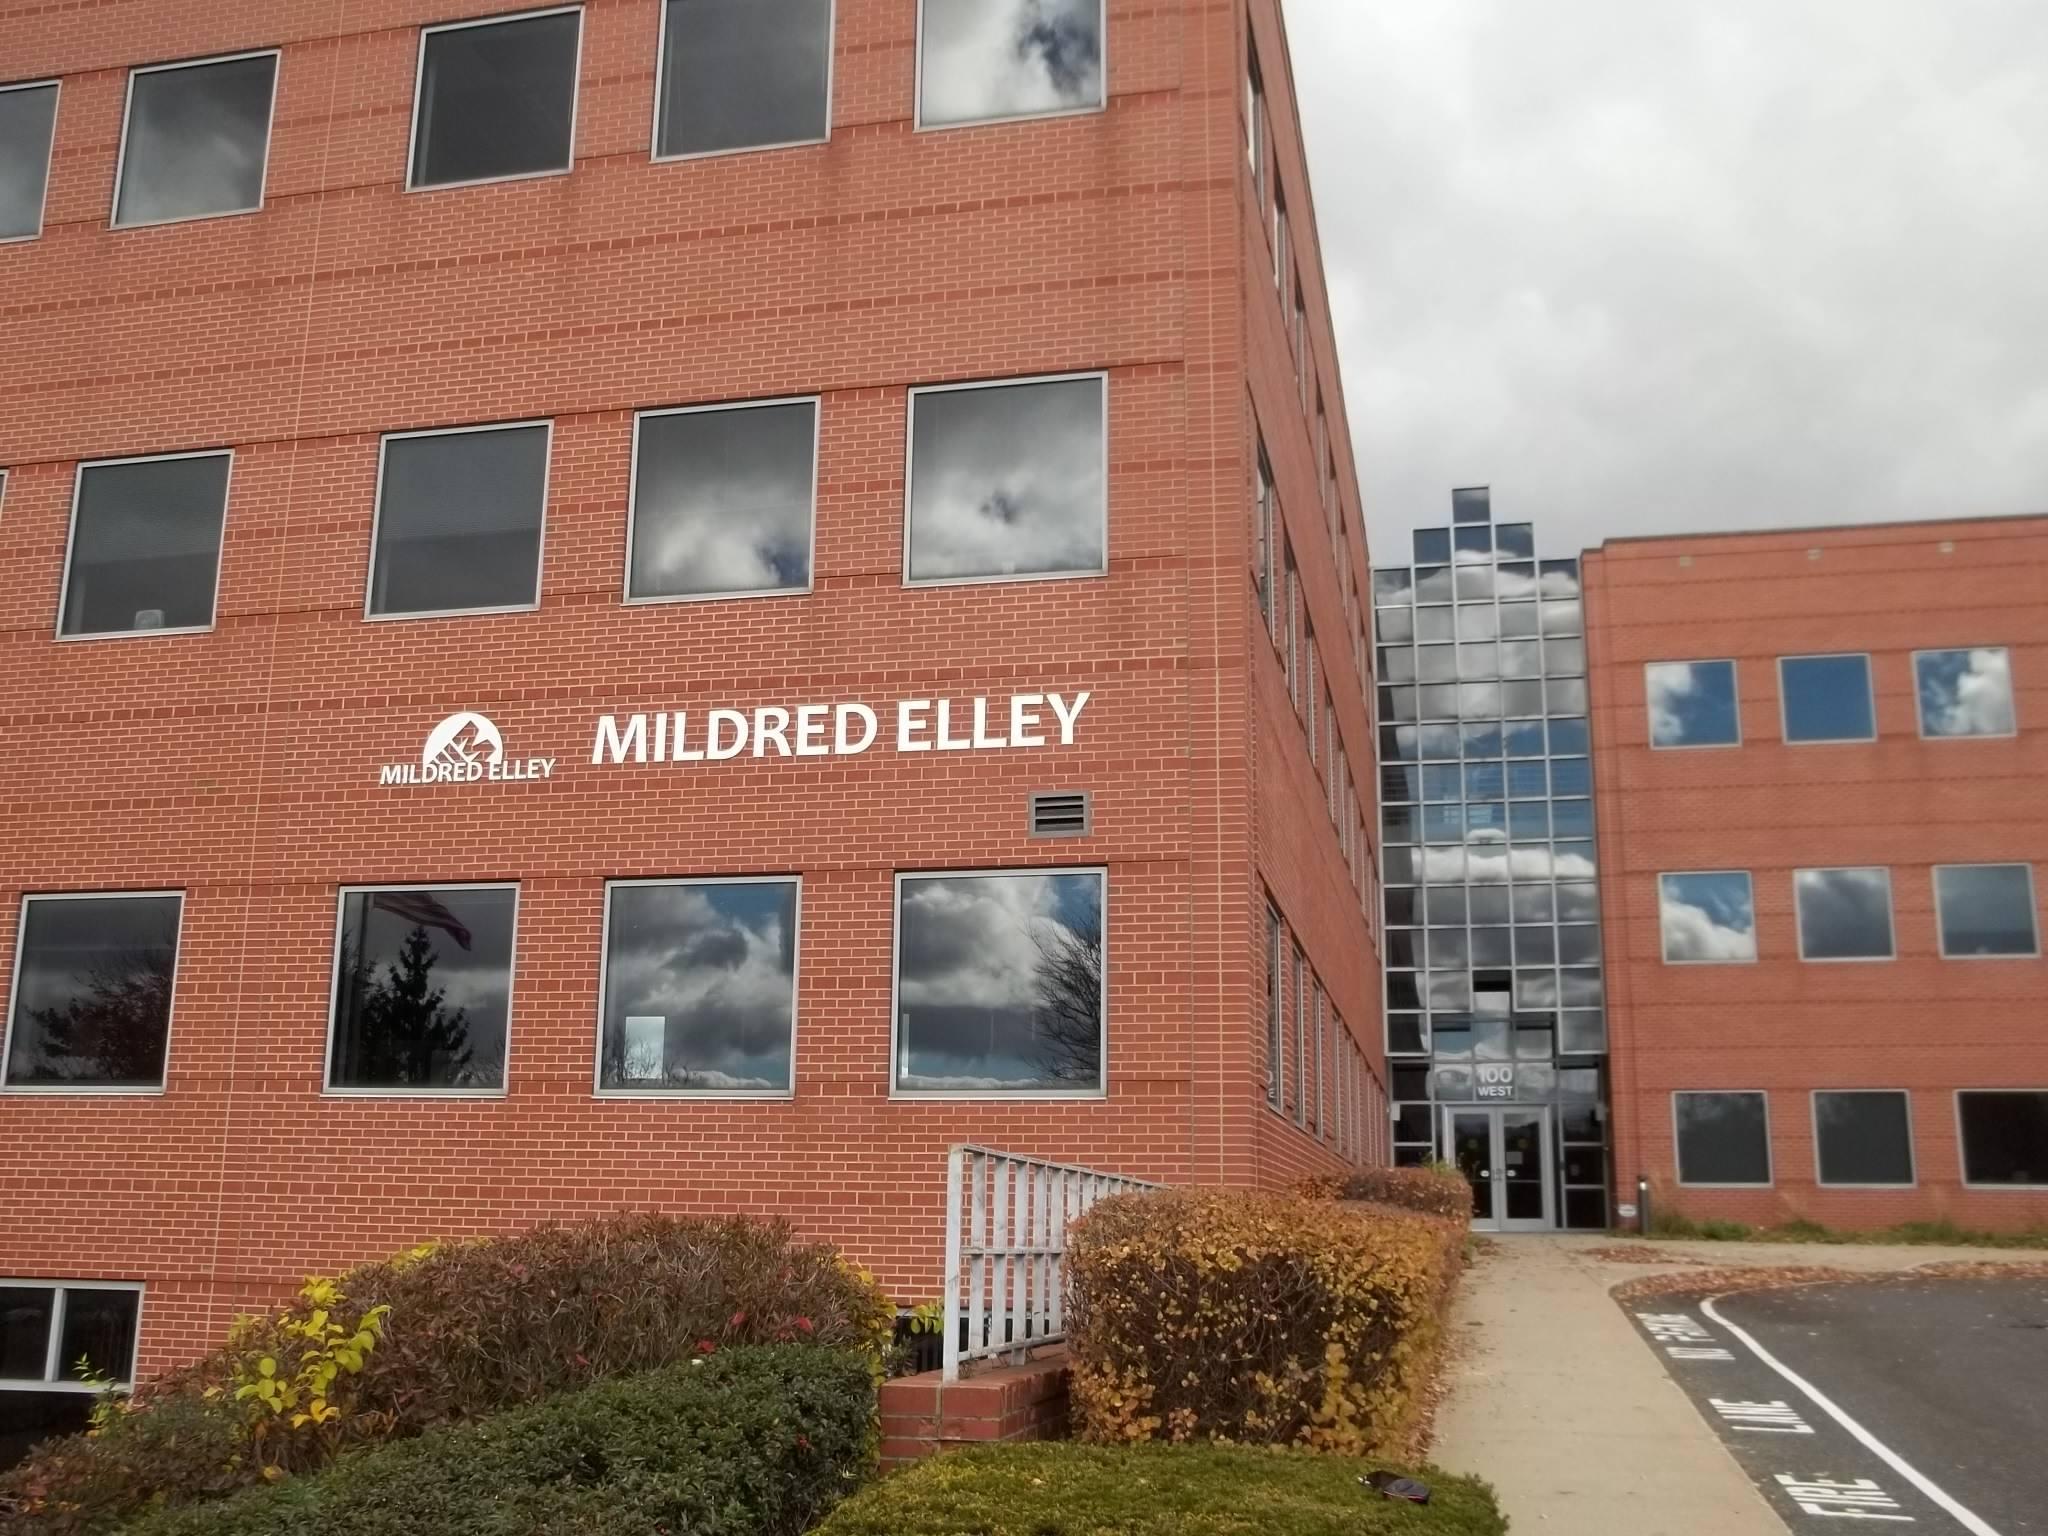 Mildred Elley